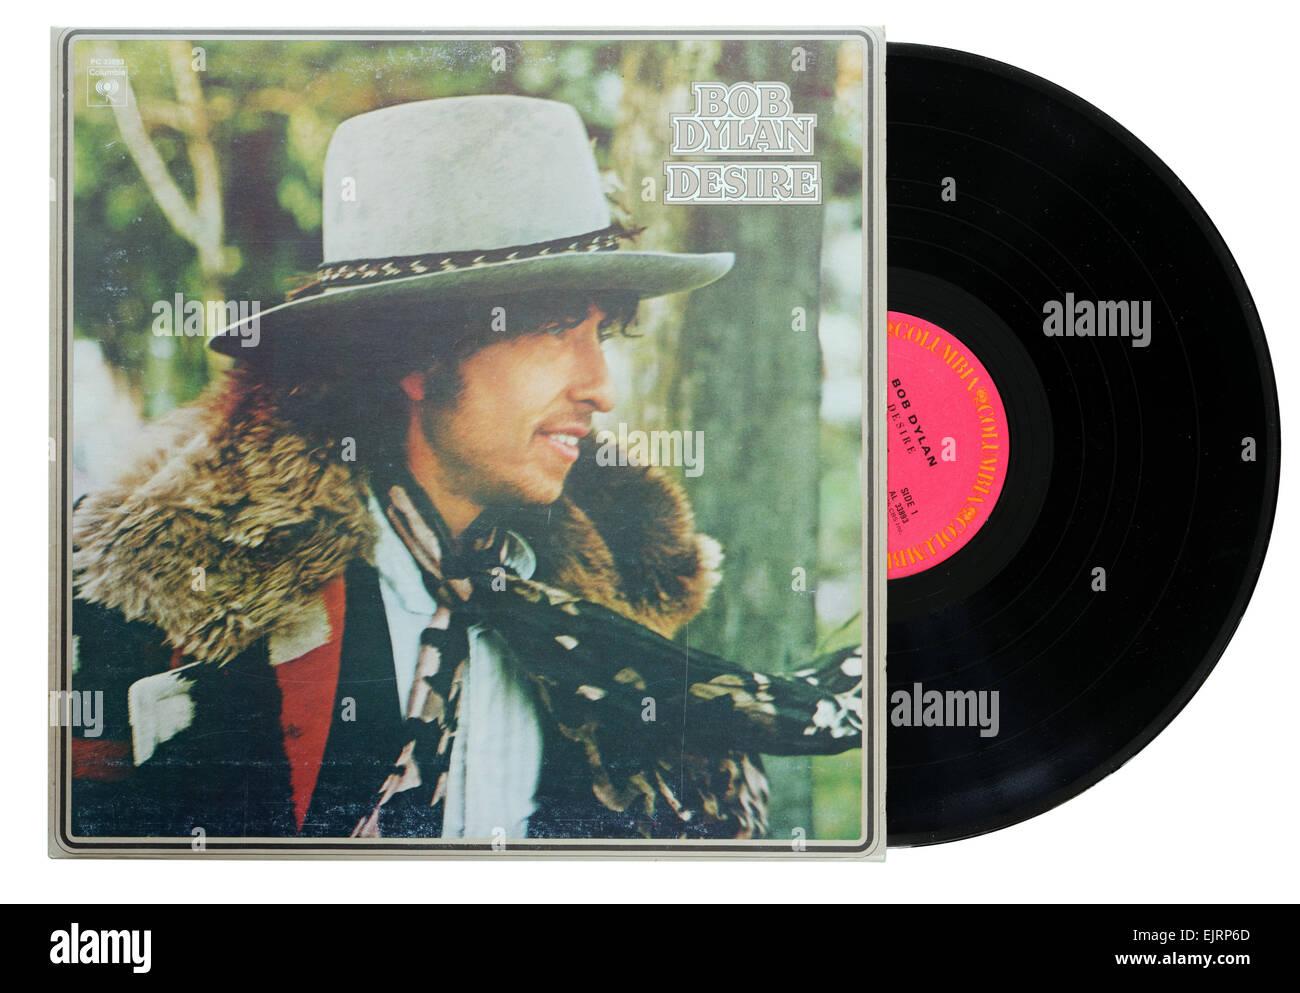 Bob Dylan Desire album - Stock Image